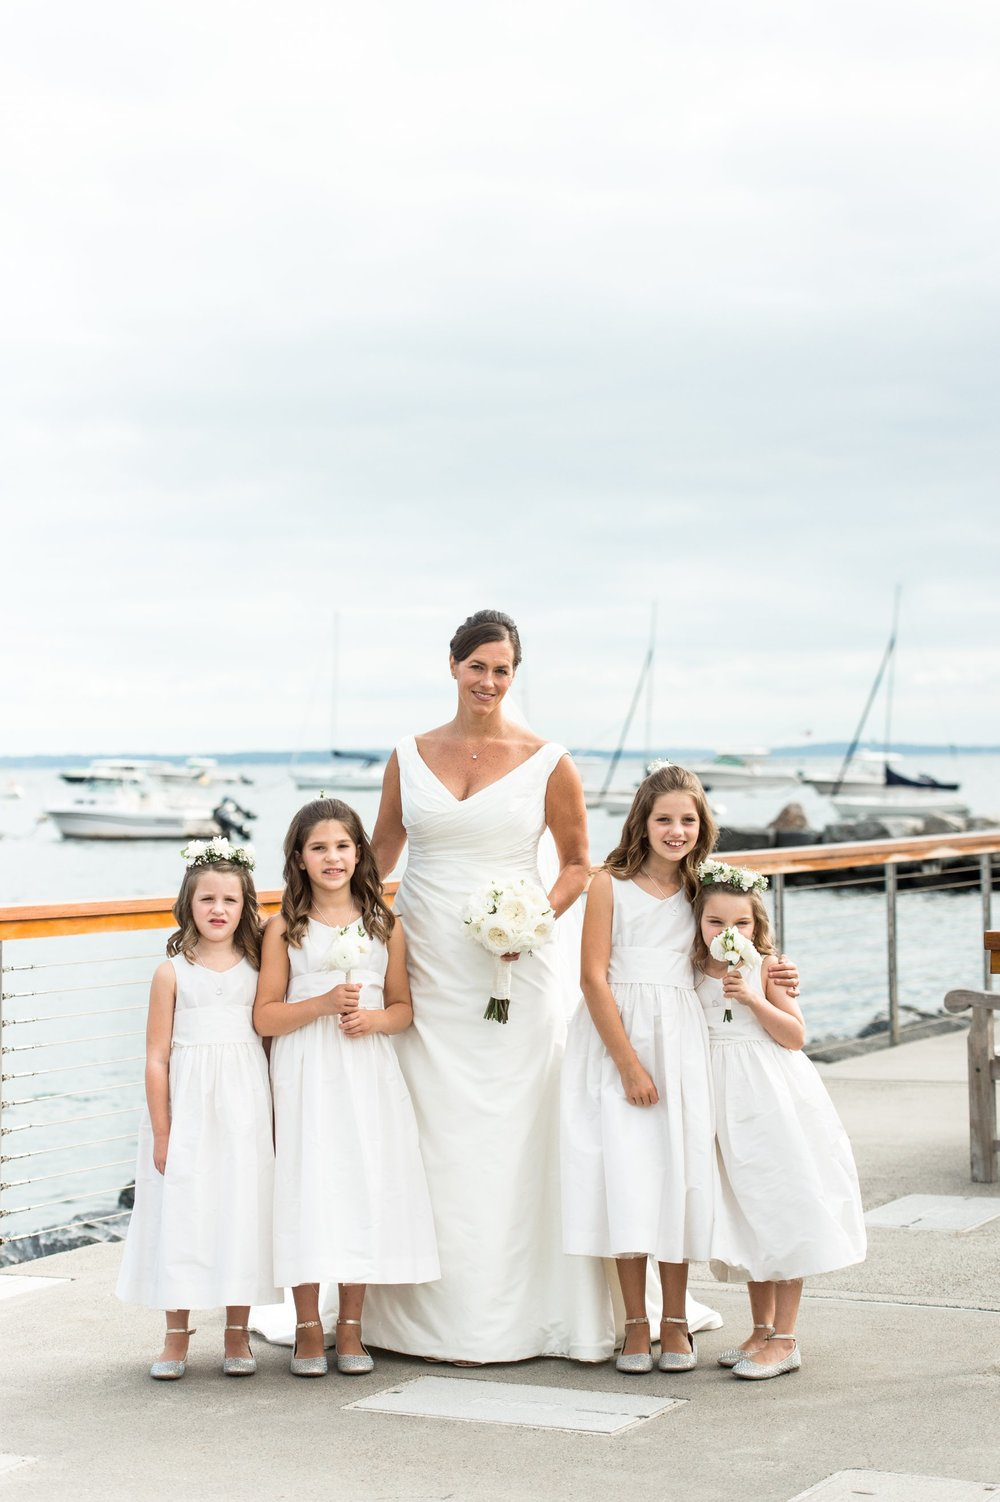 Bride in Augusta Jones dress with four little flower girls in white jcrew dresses pose on docks at Belle Haven Club for fall nautical inspired wedding